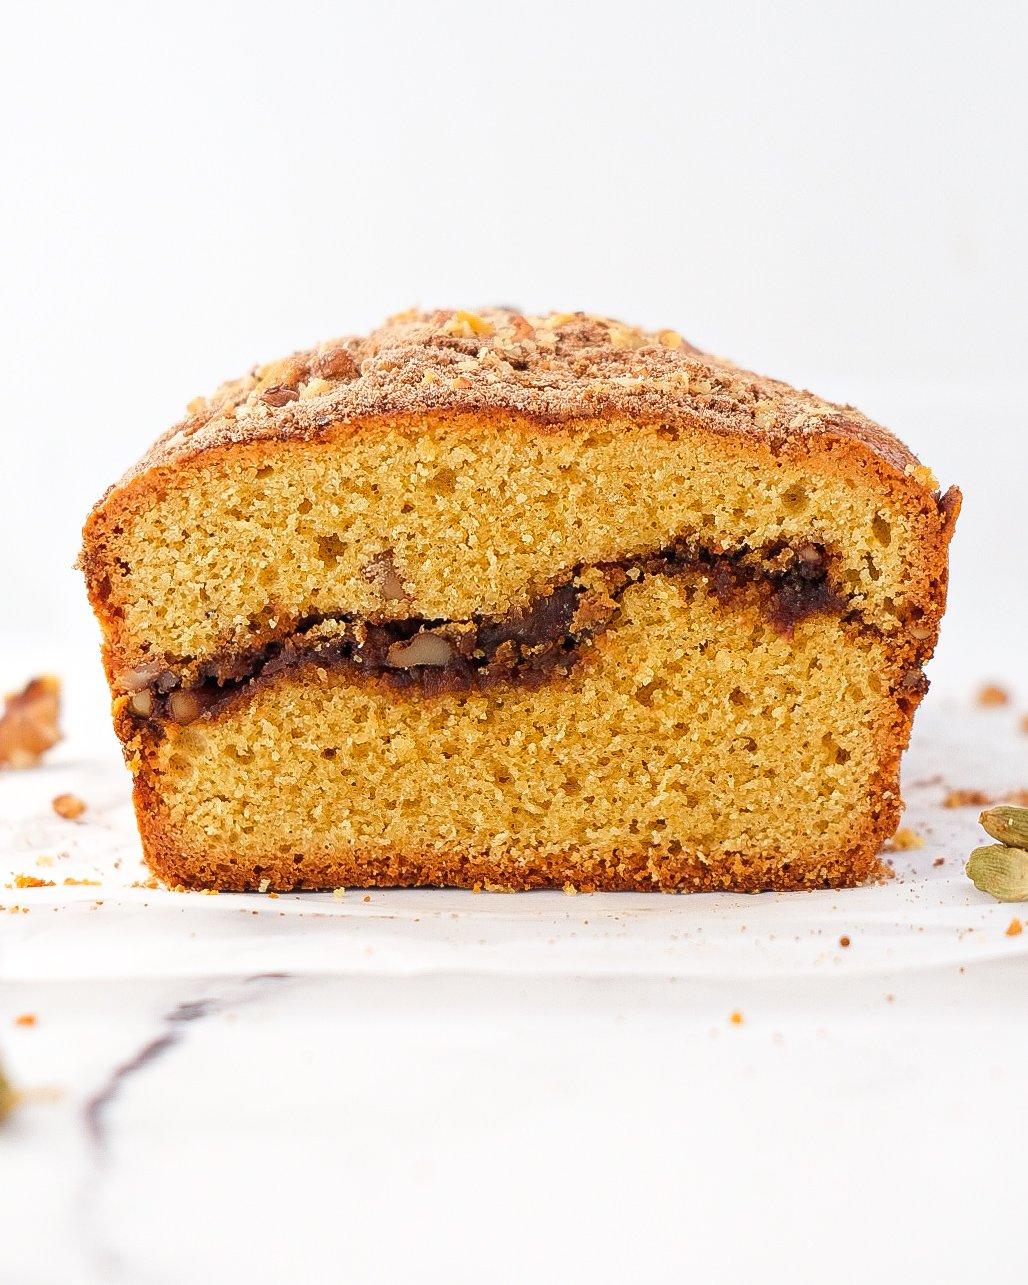 Walnut Cardamom Streusel Bread (paleo)